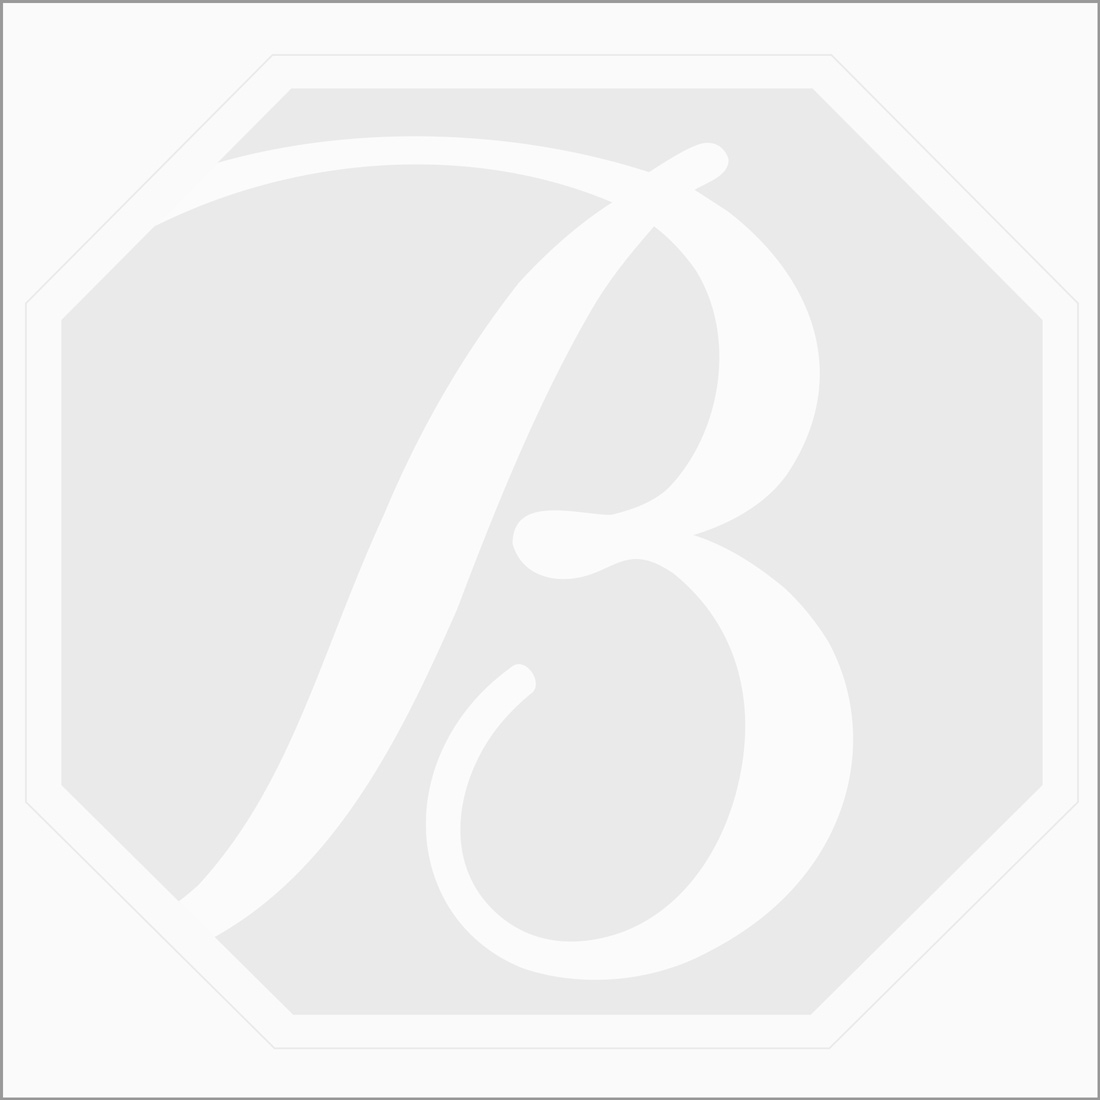 5 Pcs - 12.47 ct. -Medium Blue Aquamarine Oval Cabochon - 8.9 x 7 x 3.7 mm to 10.1  8.1 x 4.2 mm (AQCAB1028)